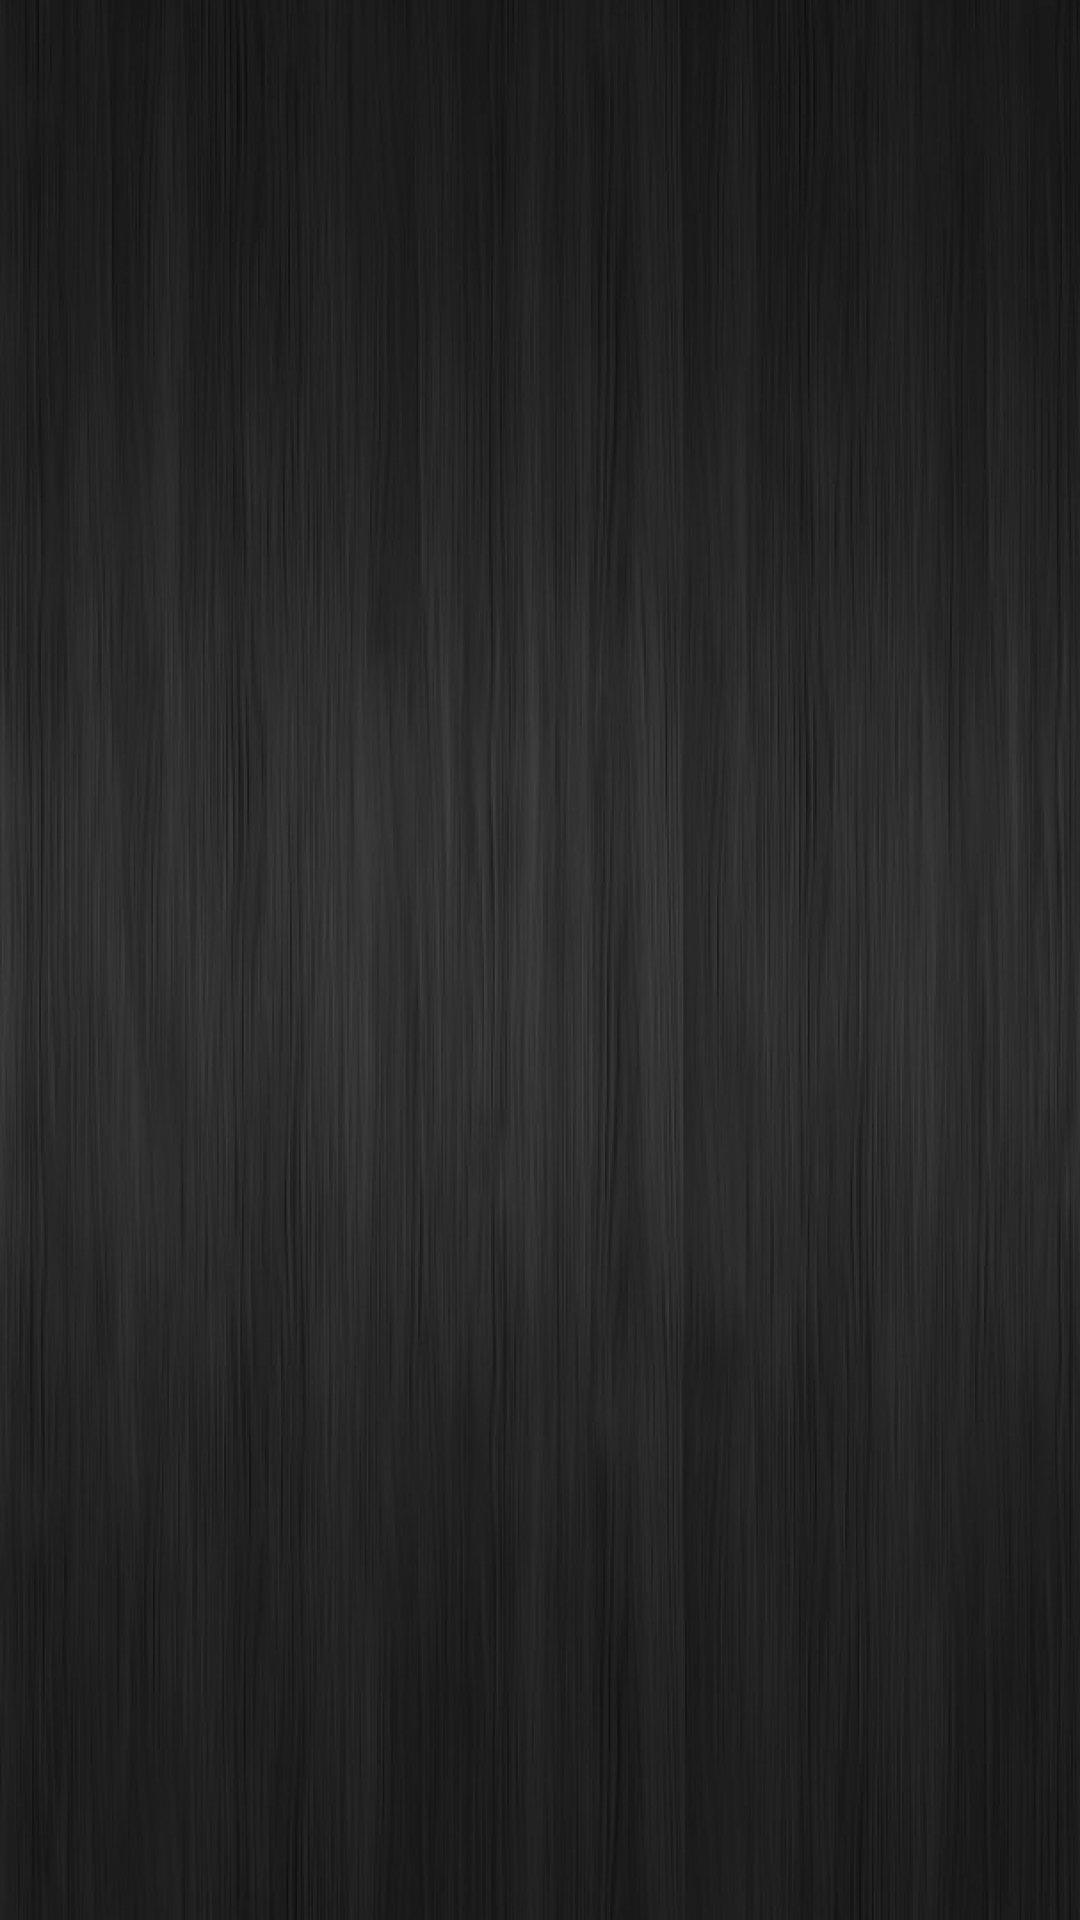 Download Wallpaper 1080x1920 band, vertical, background, dark Sony ...